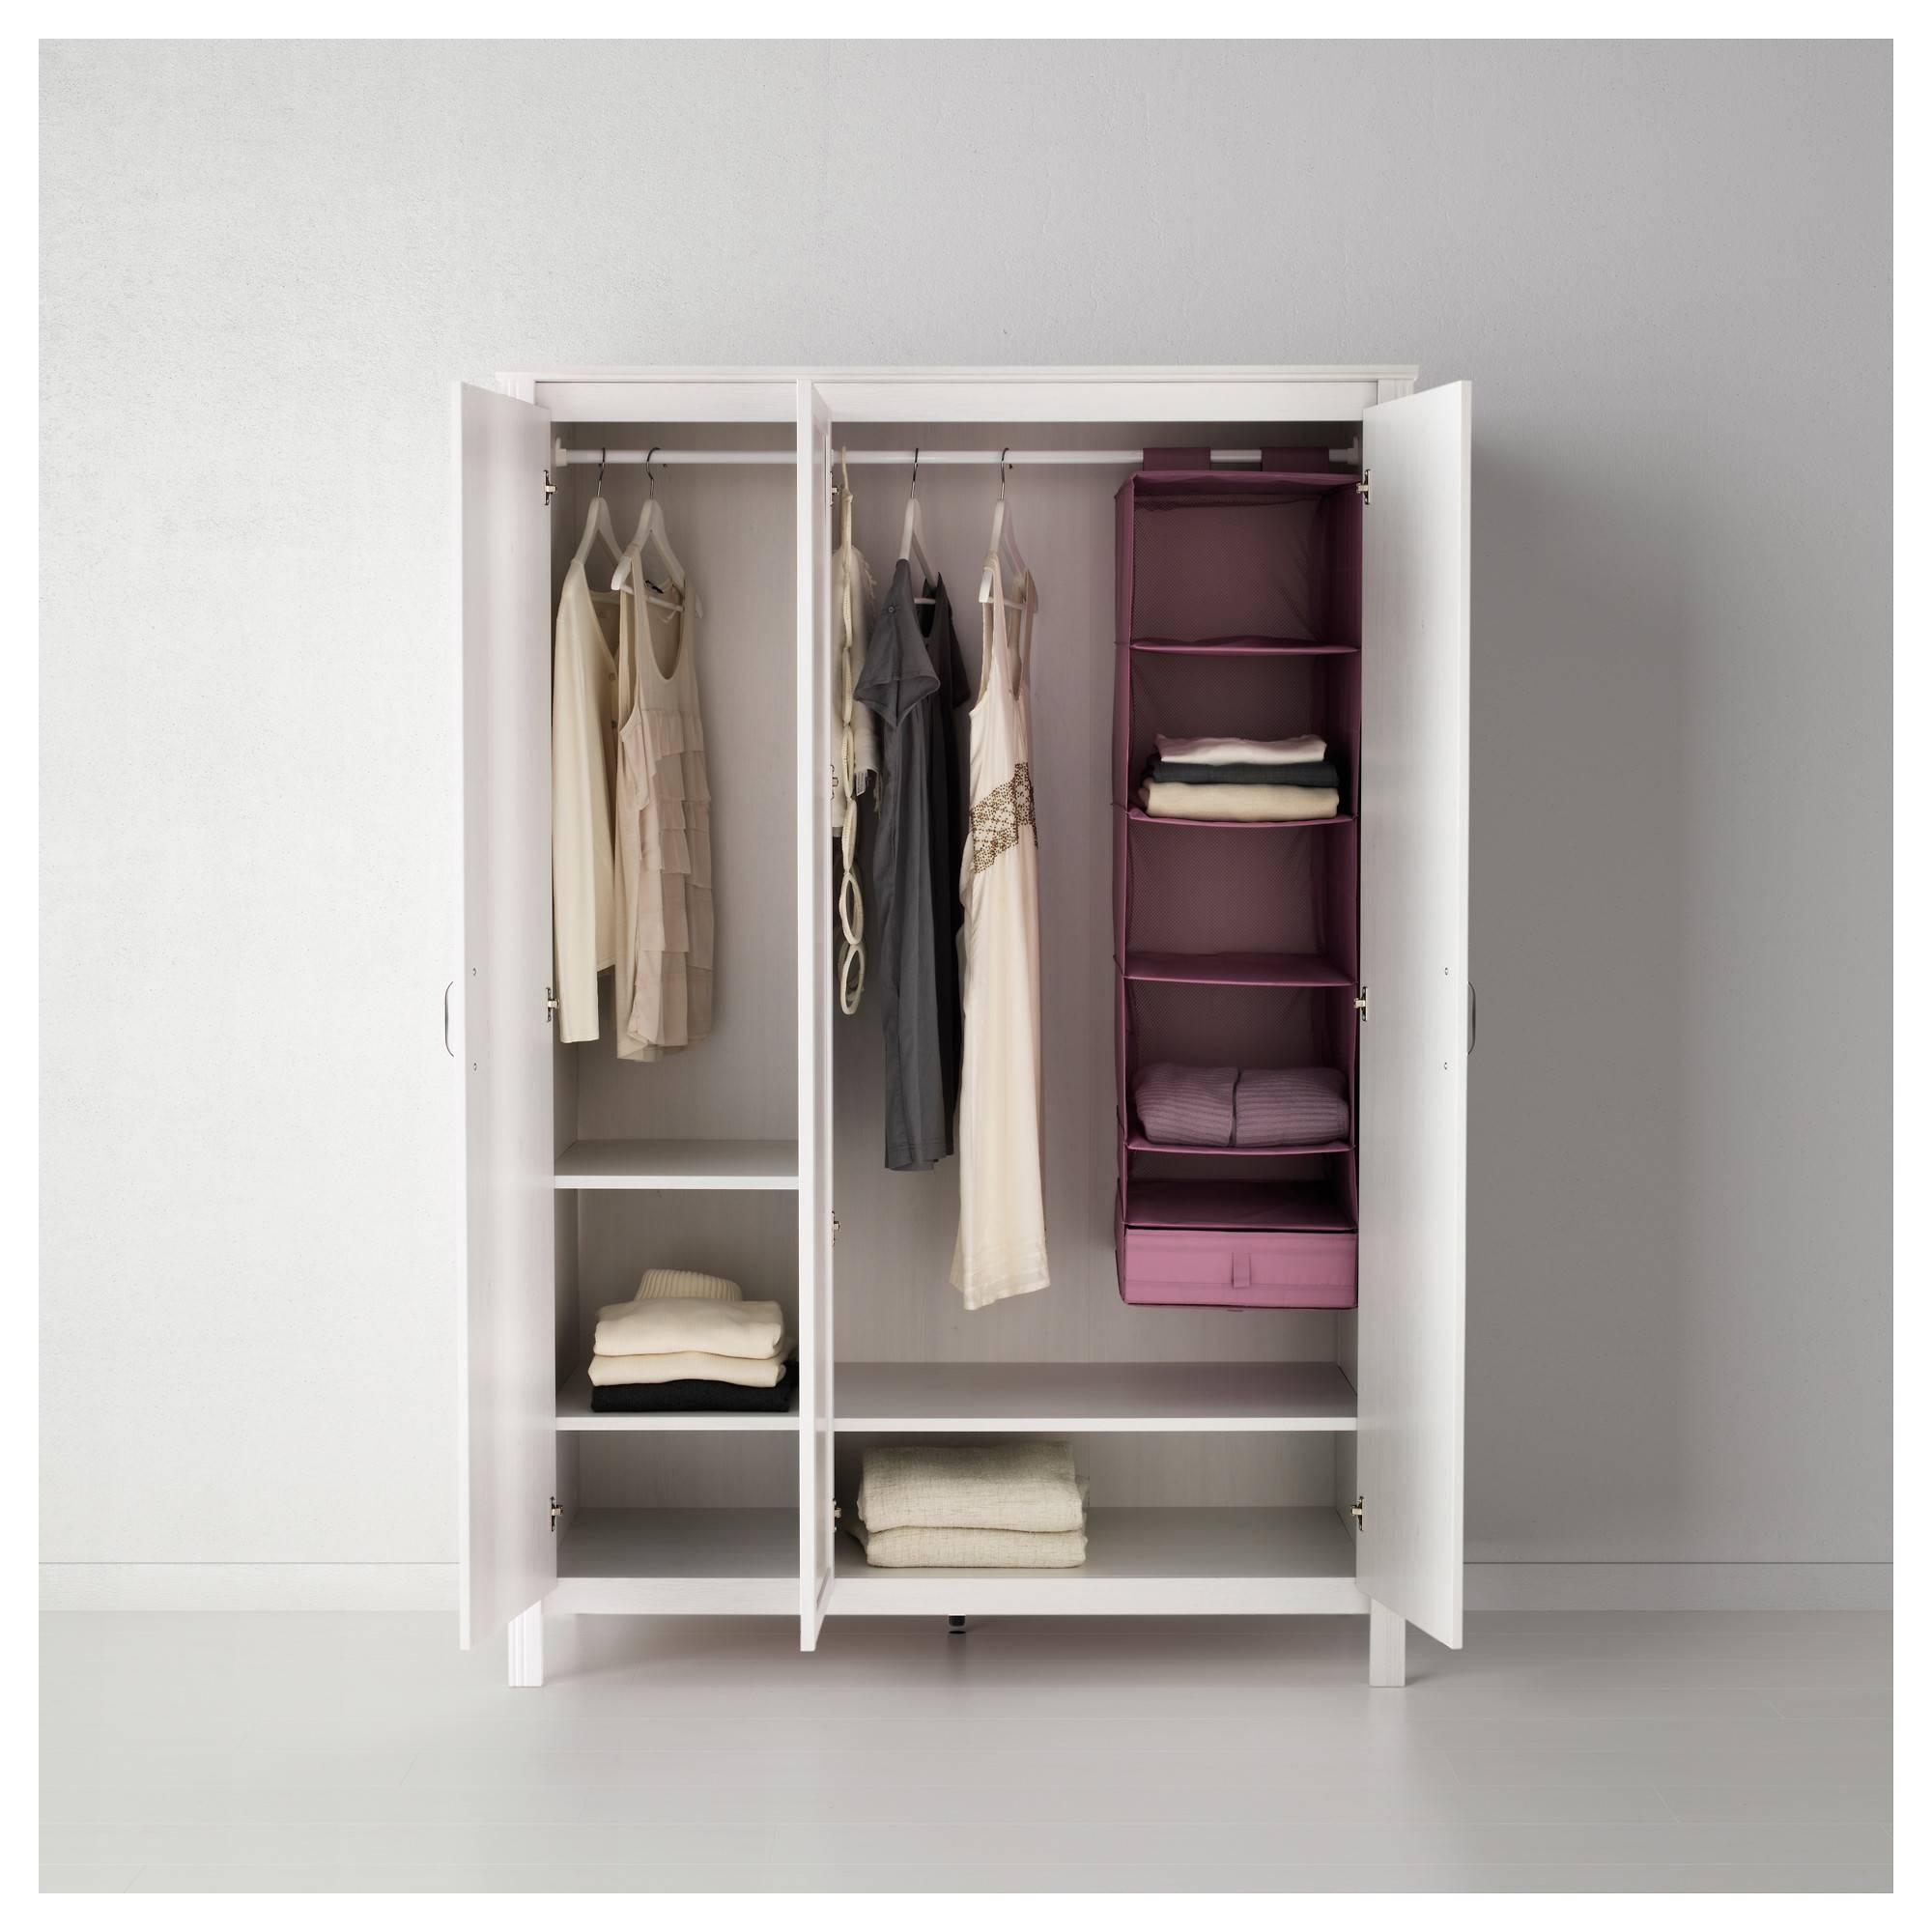 Brusali Wardrobe With 3 Doors White 131X190 Cm - Ikea for 3 Door Wardrobes (Image 8 of 15)